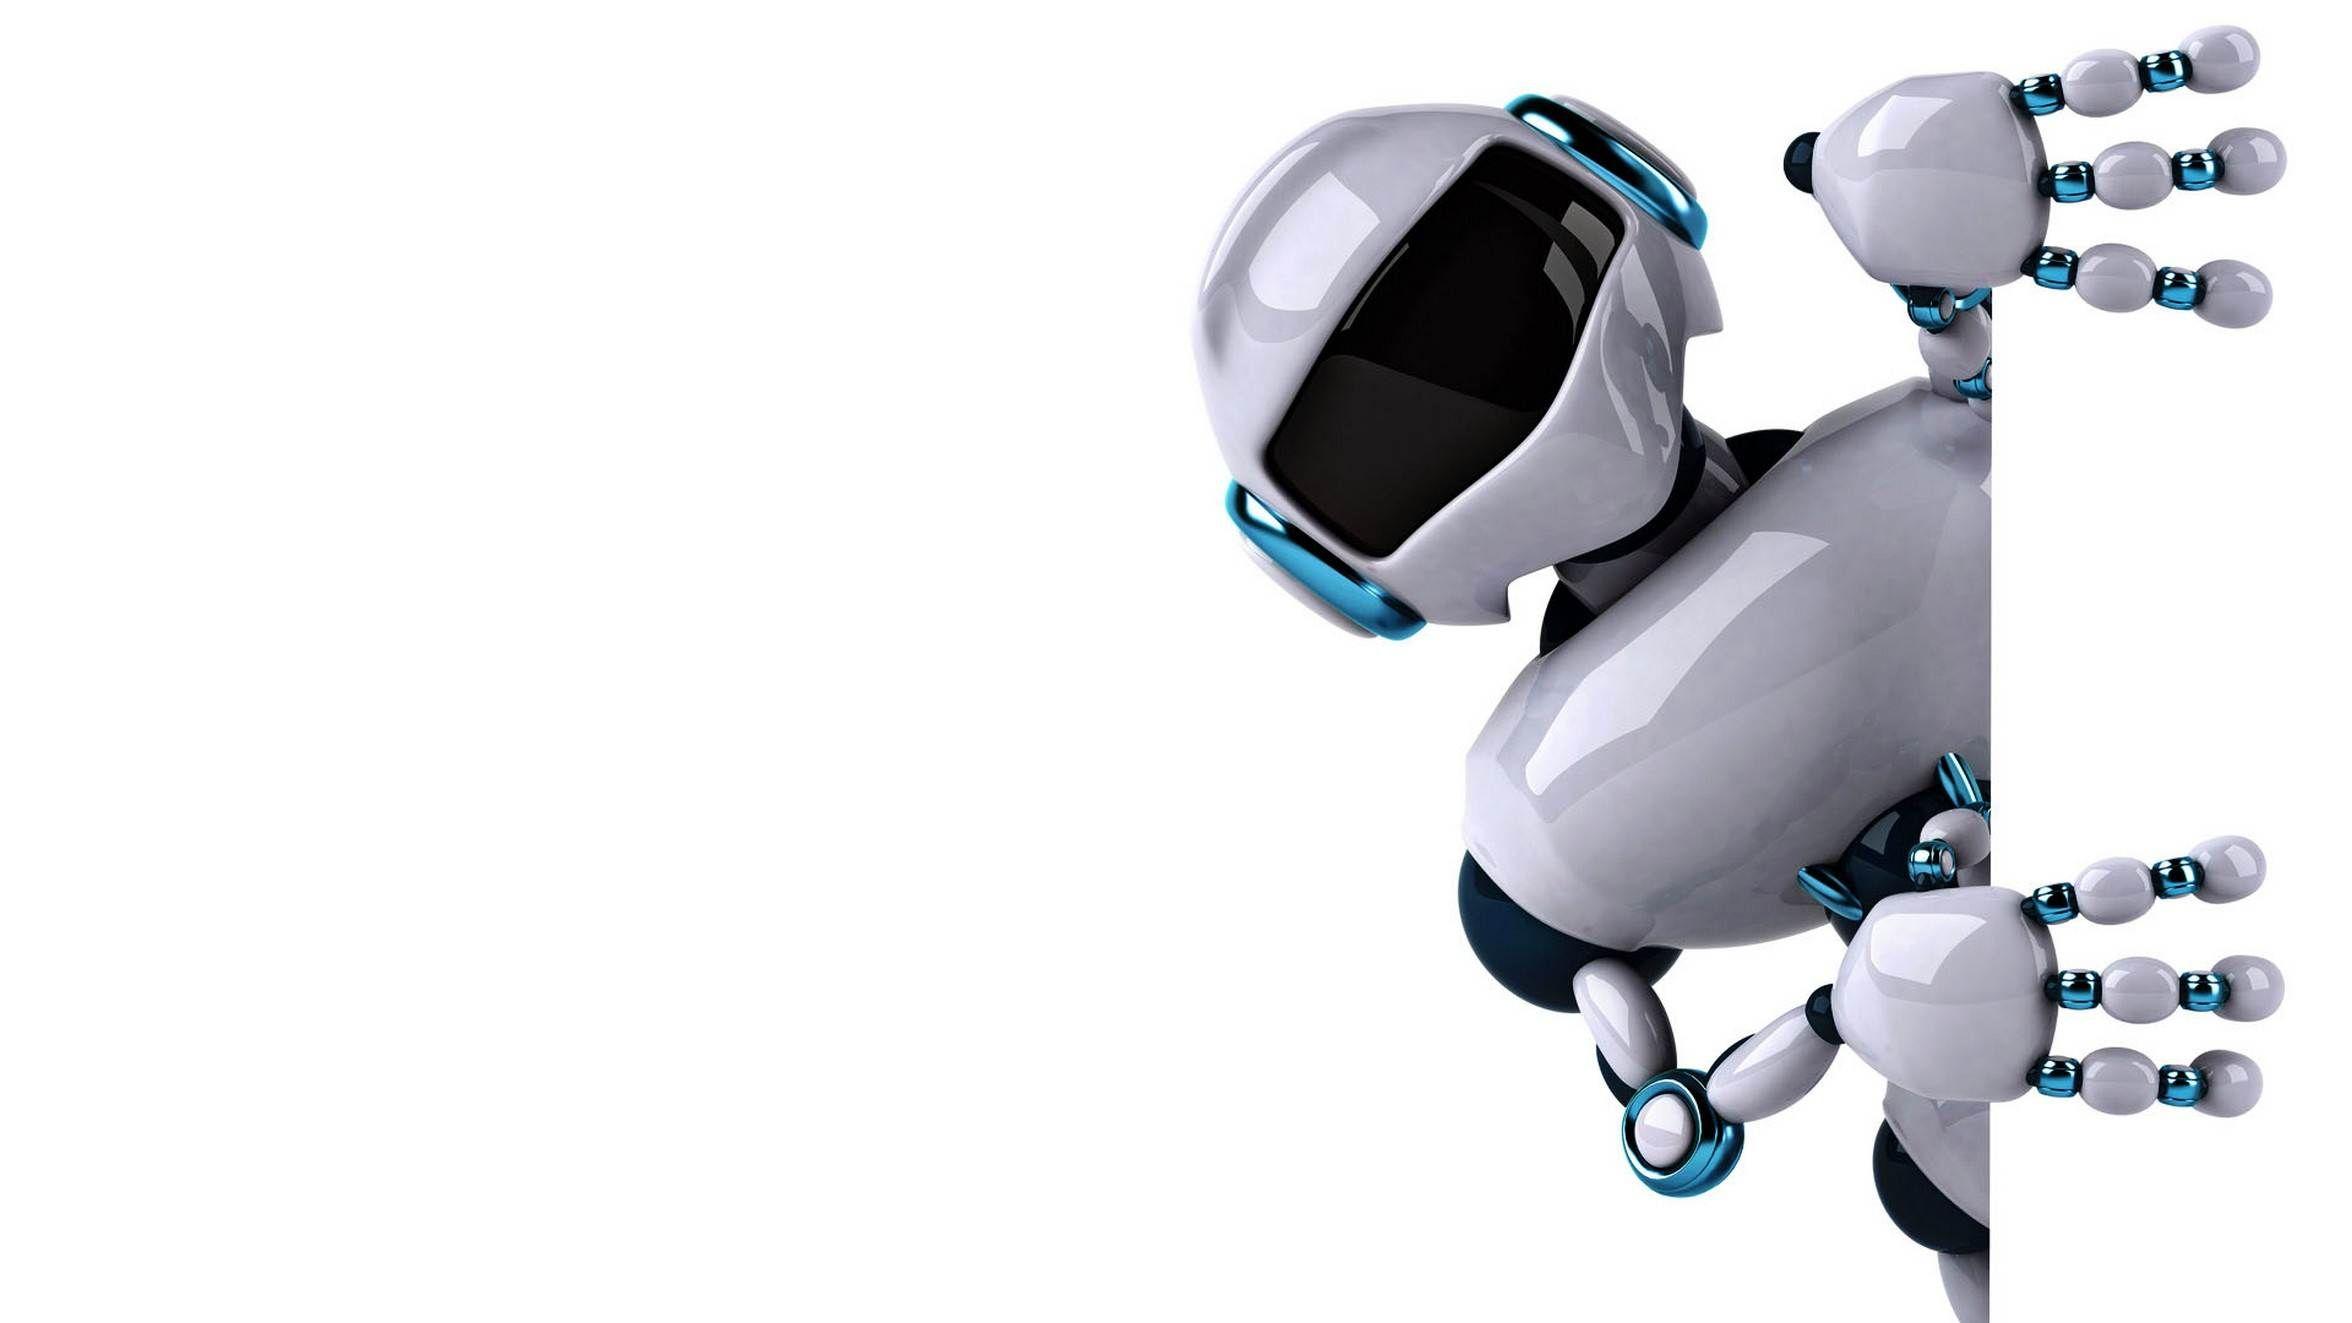 cool artificial intelligence robot wallpaper 14 hd wallpapers